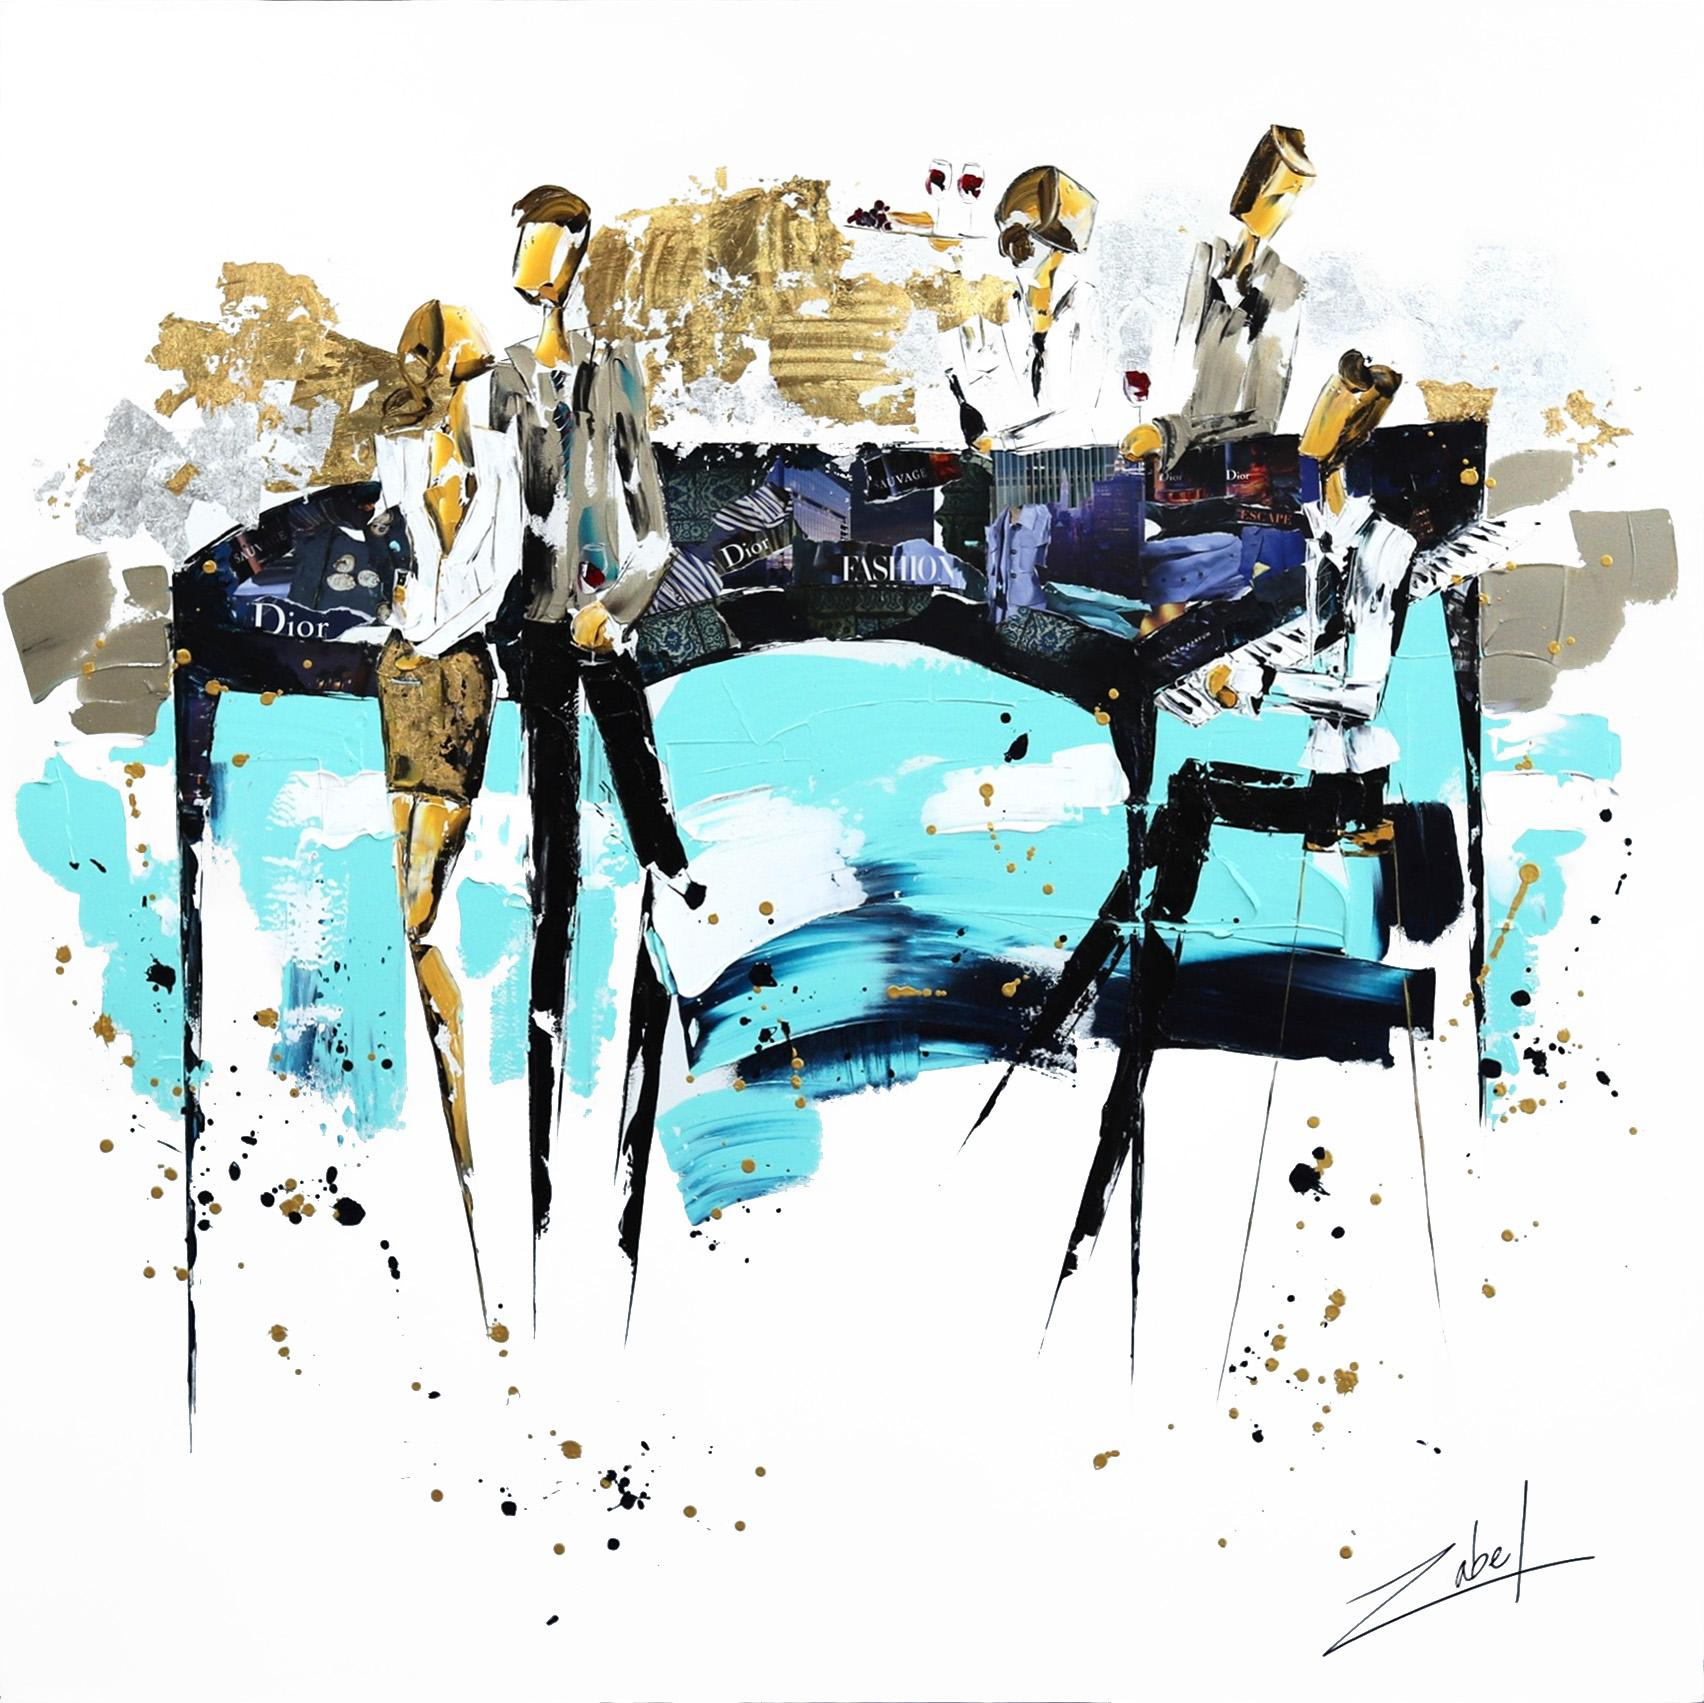 Dior's Music